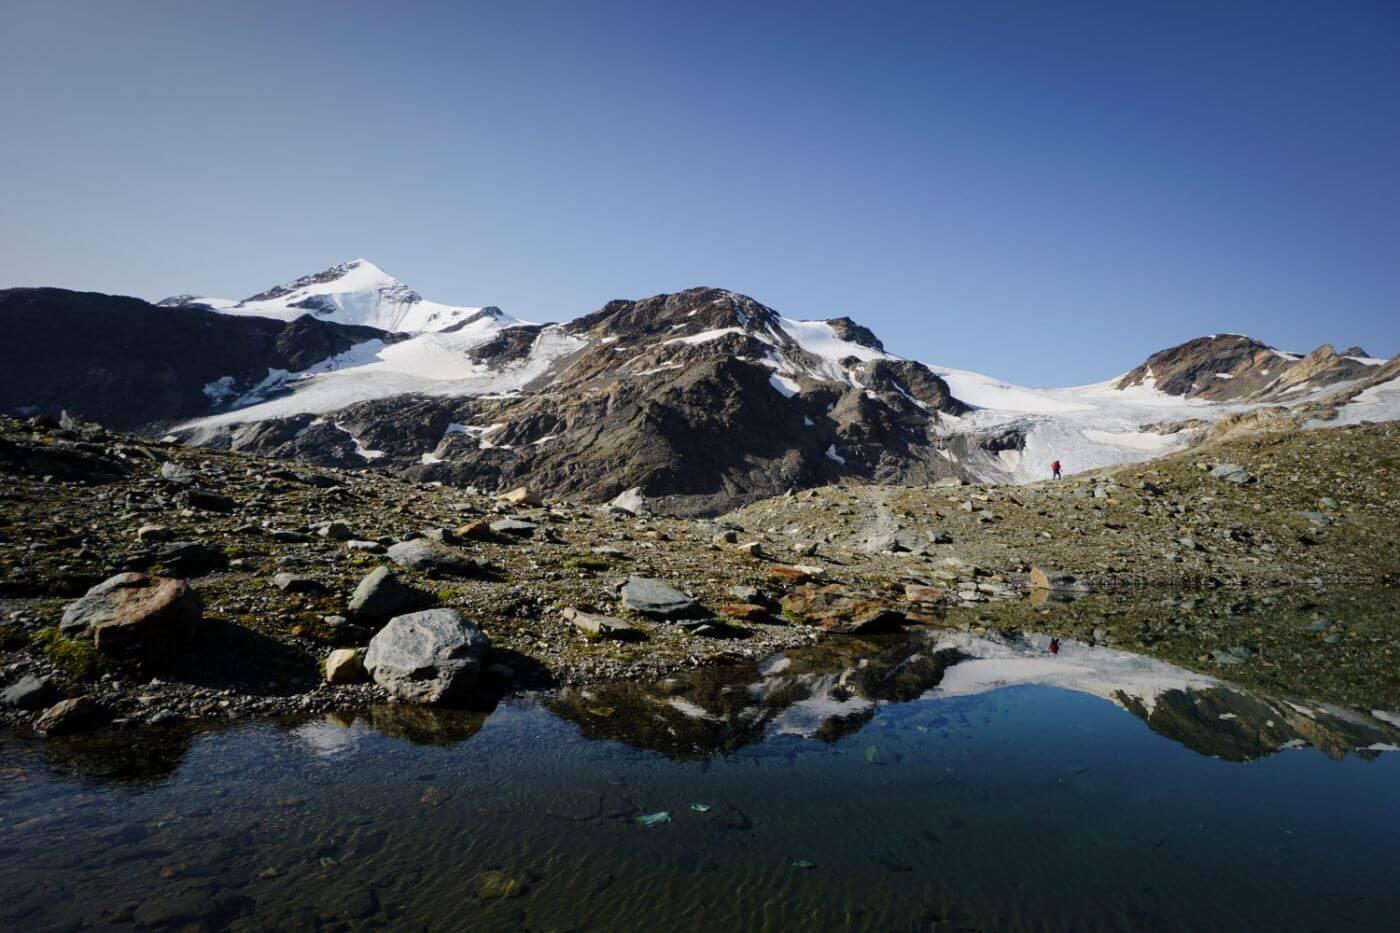 Ortler High Trail, Upper Martell Valley, Italian Alps